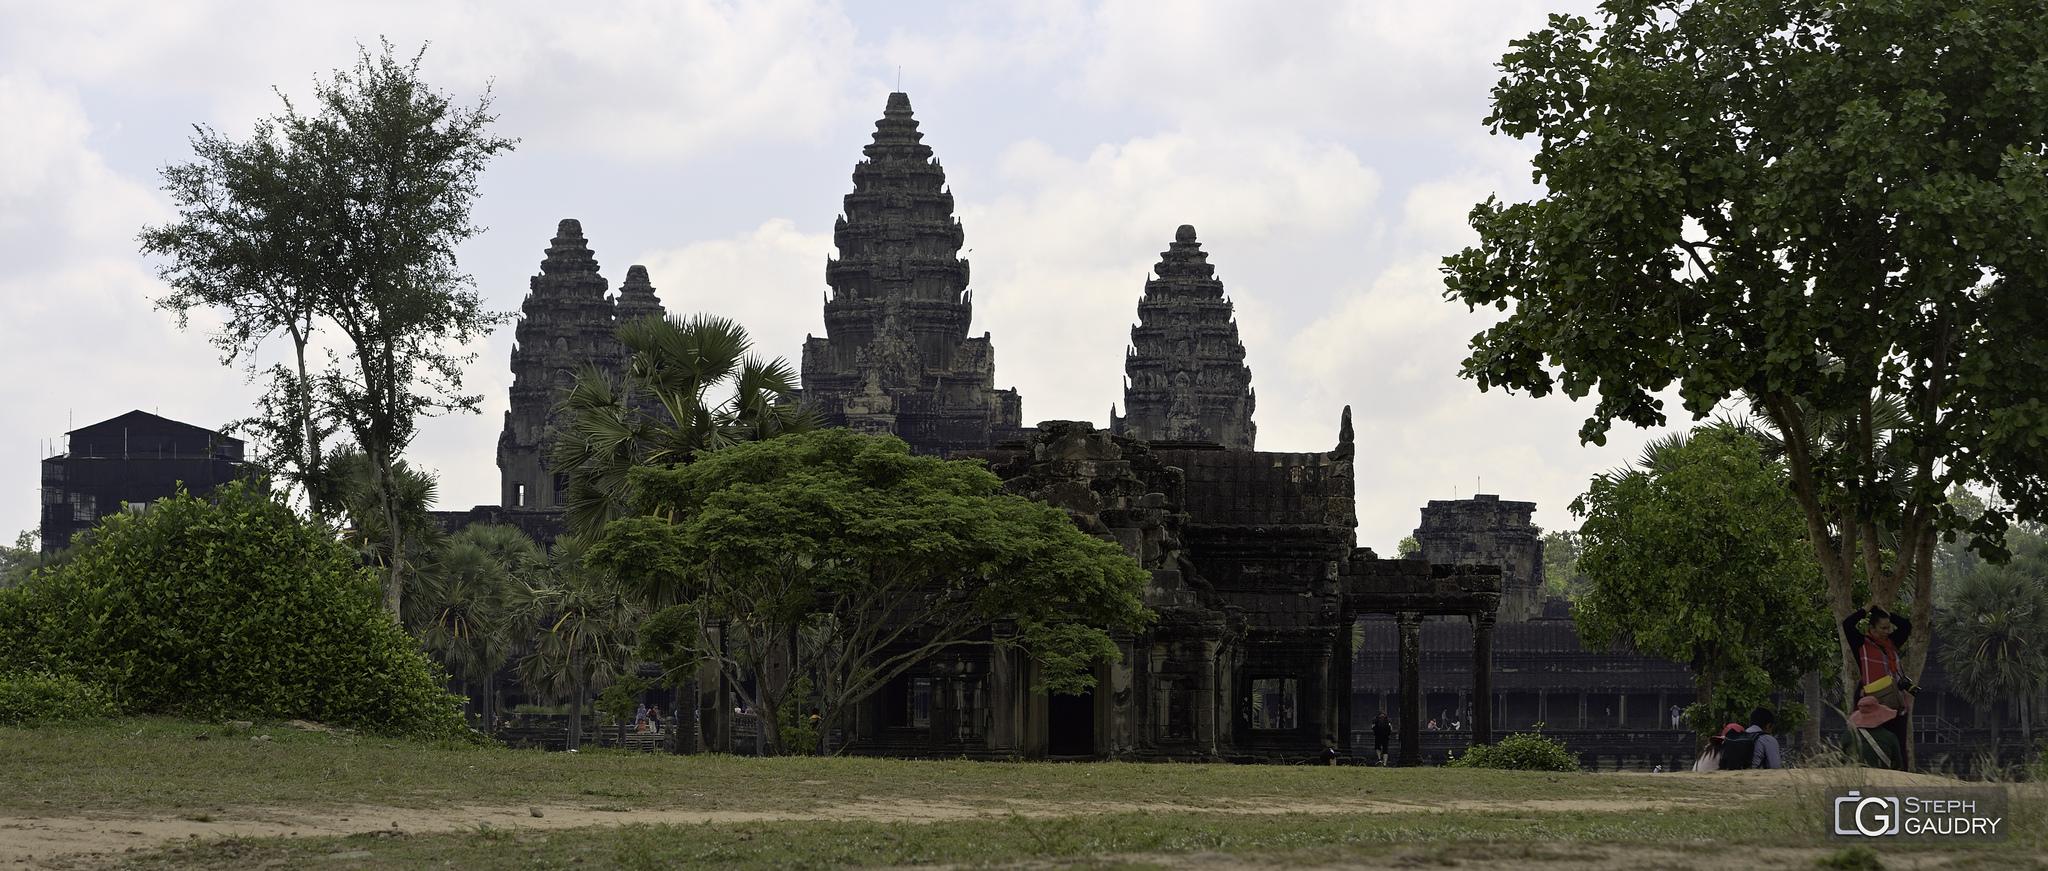 Angkor 2018_05_01_095656 [Click to start slideshow]